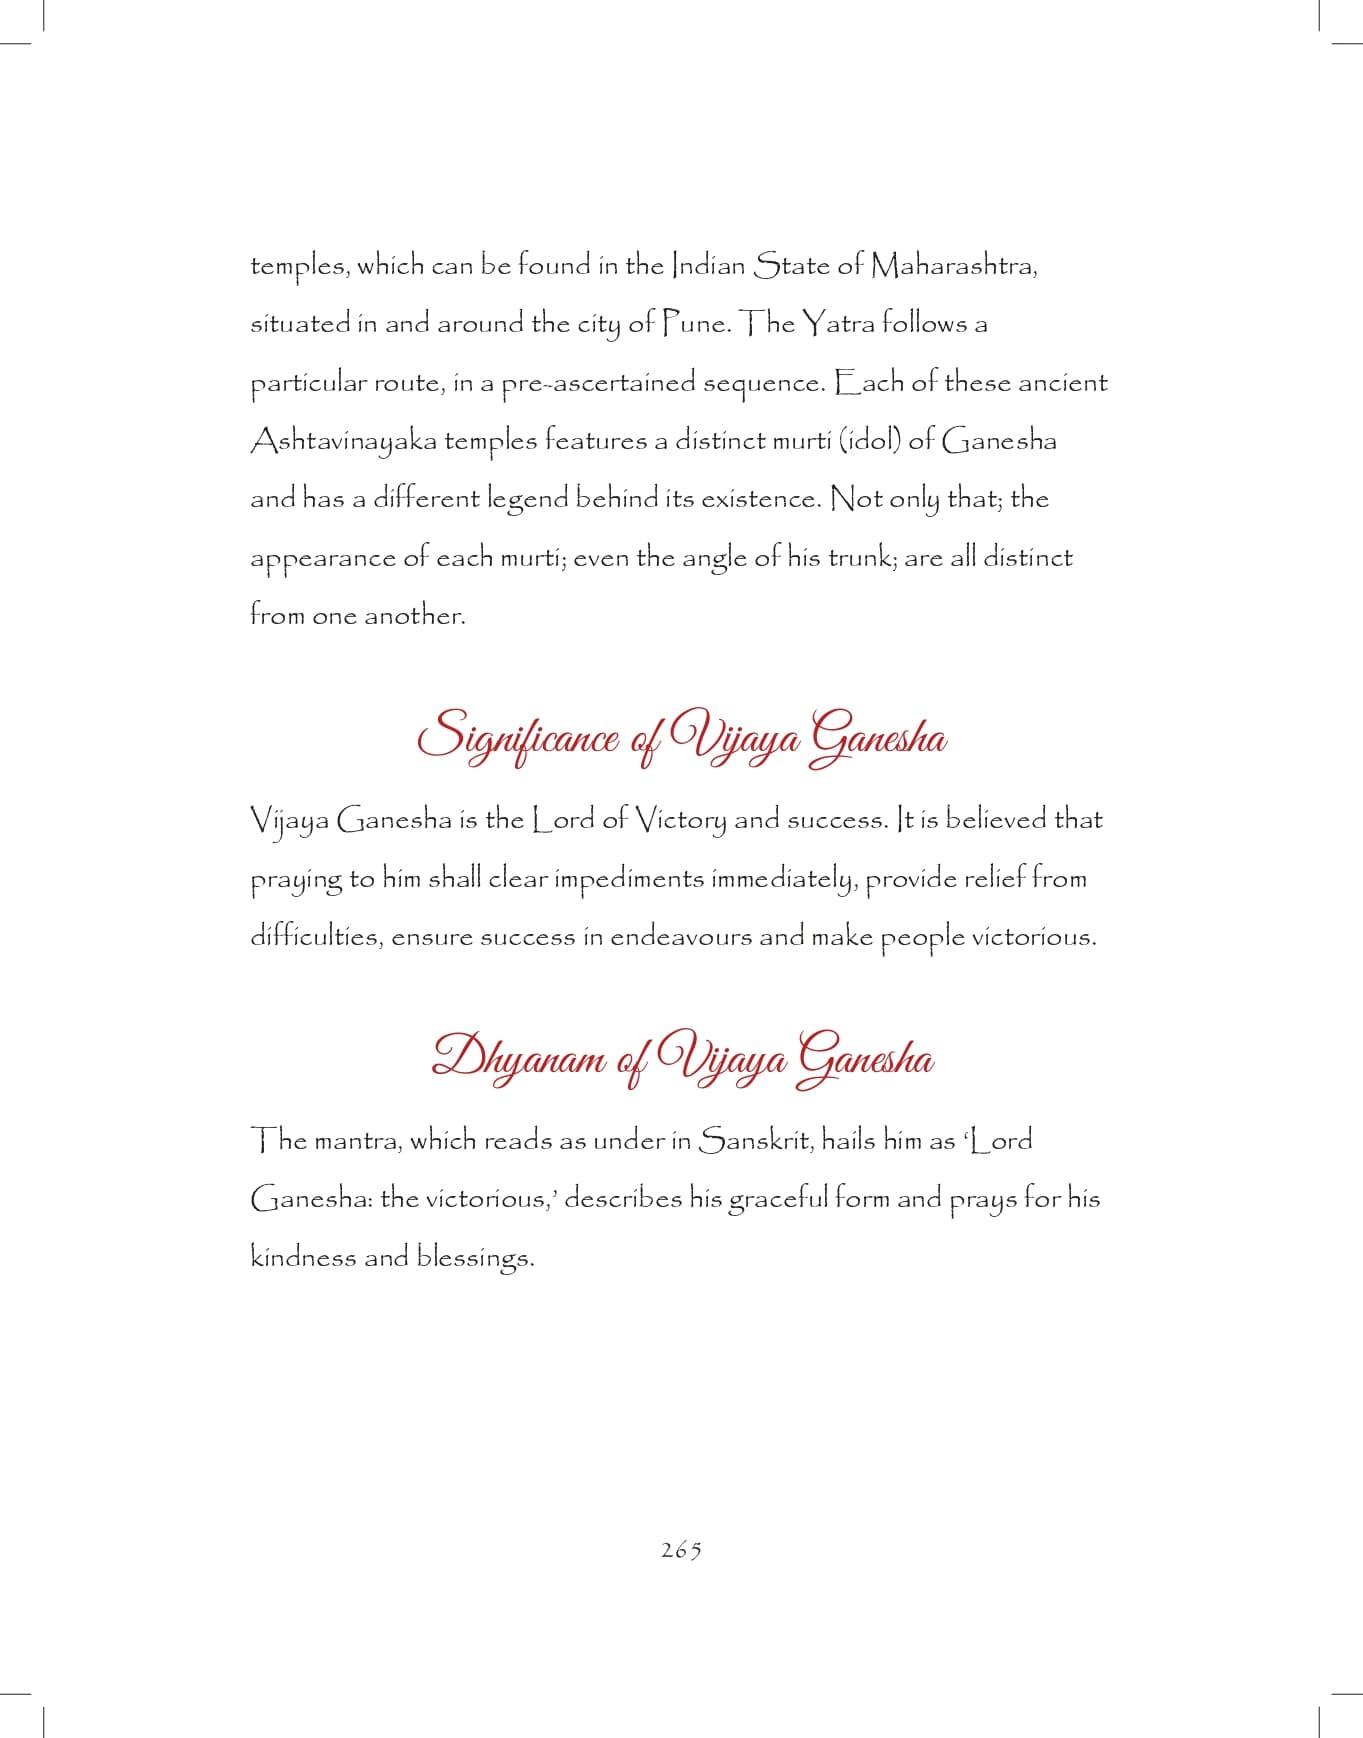 Ganesh-print_pages-to-jpg-0265.jpg